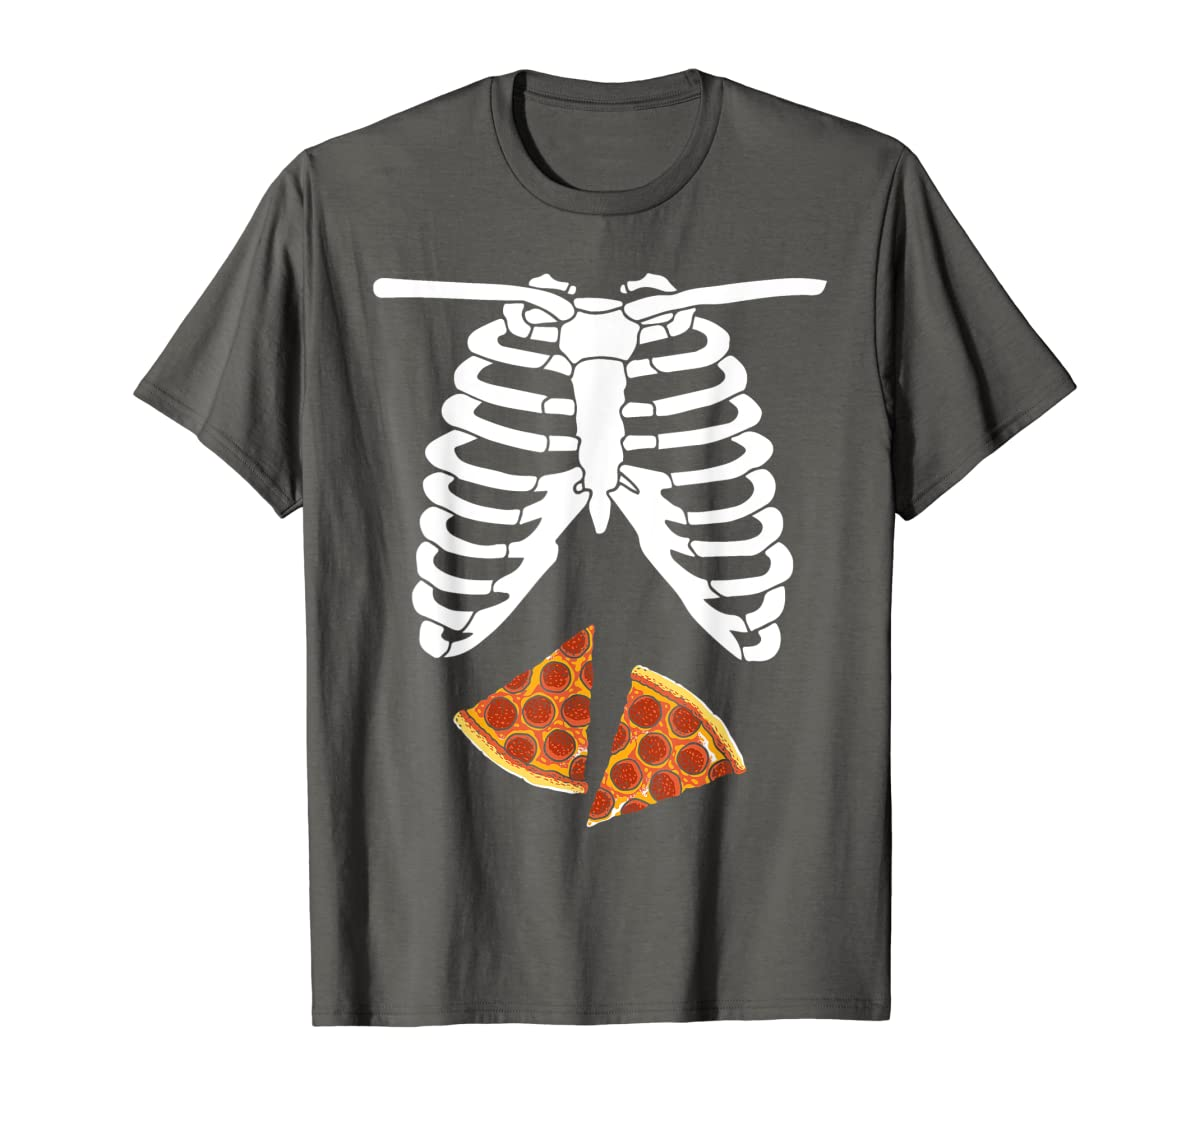 Halloween Skeleton Xray Pizza Slices Costume Rib Cage Easy T-Shirt-Men's T-Shirt-Dark Heather